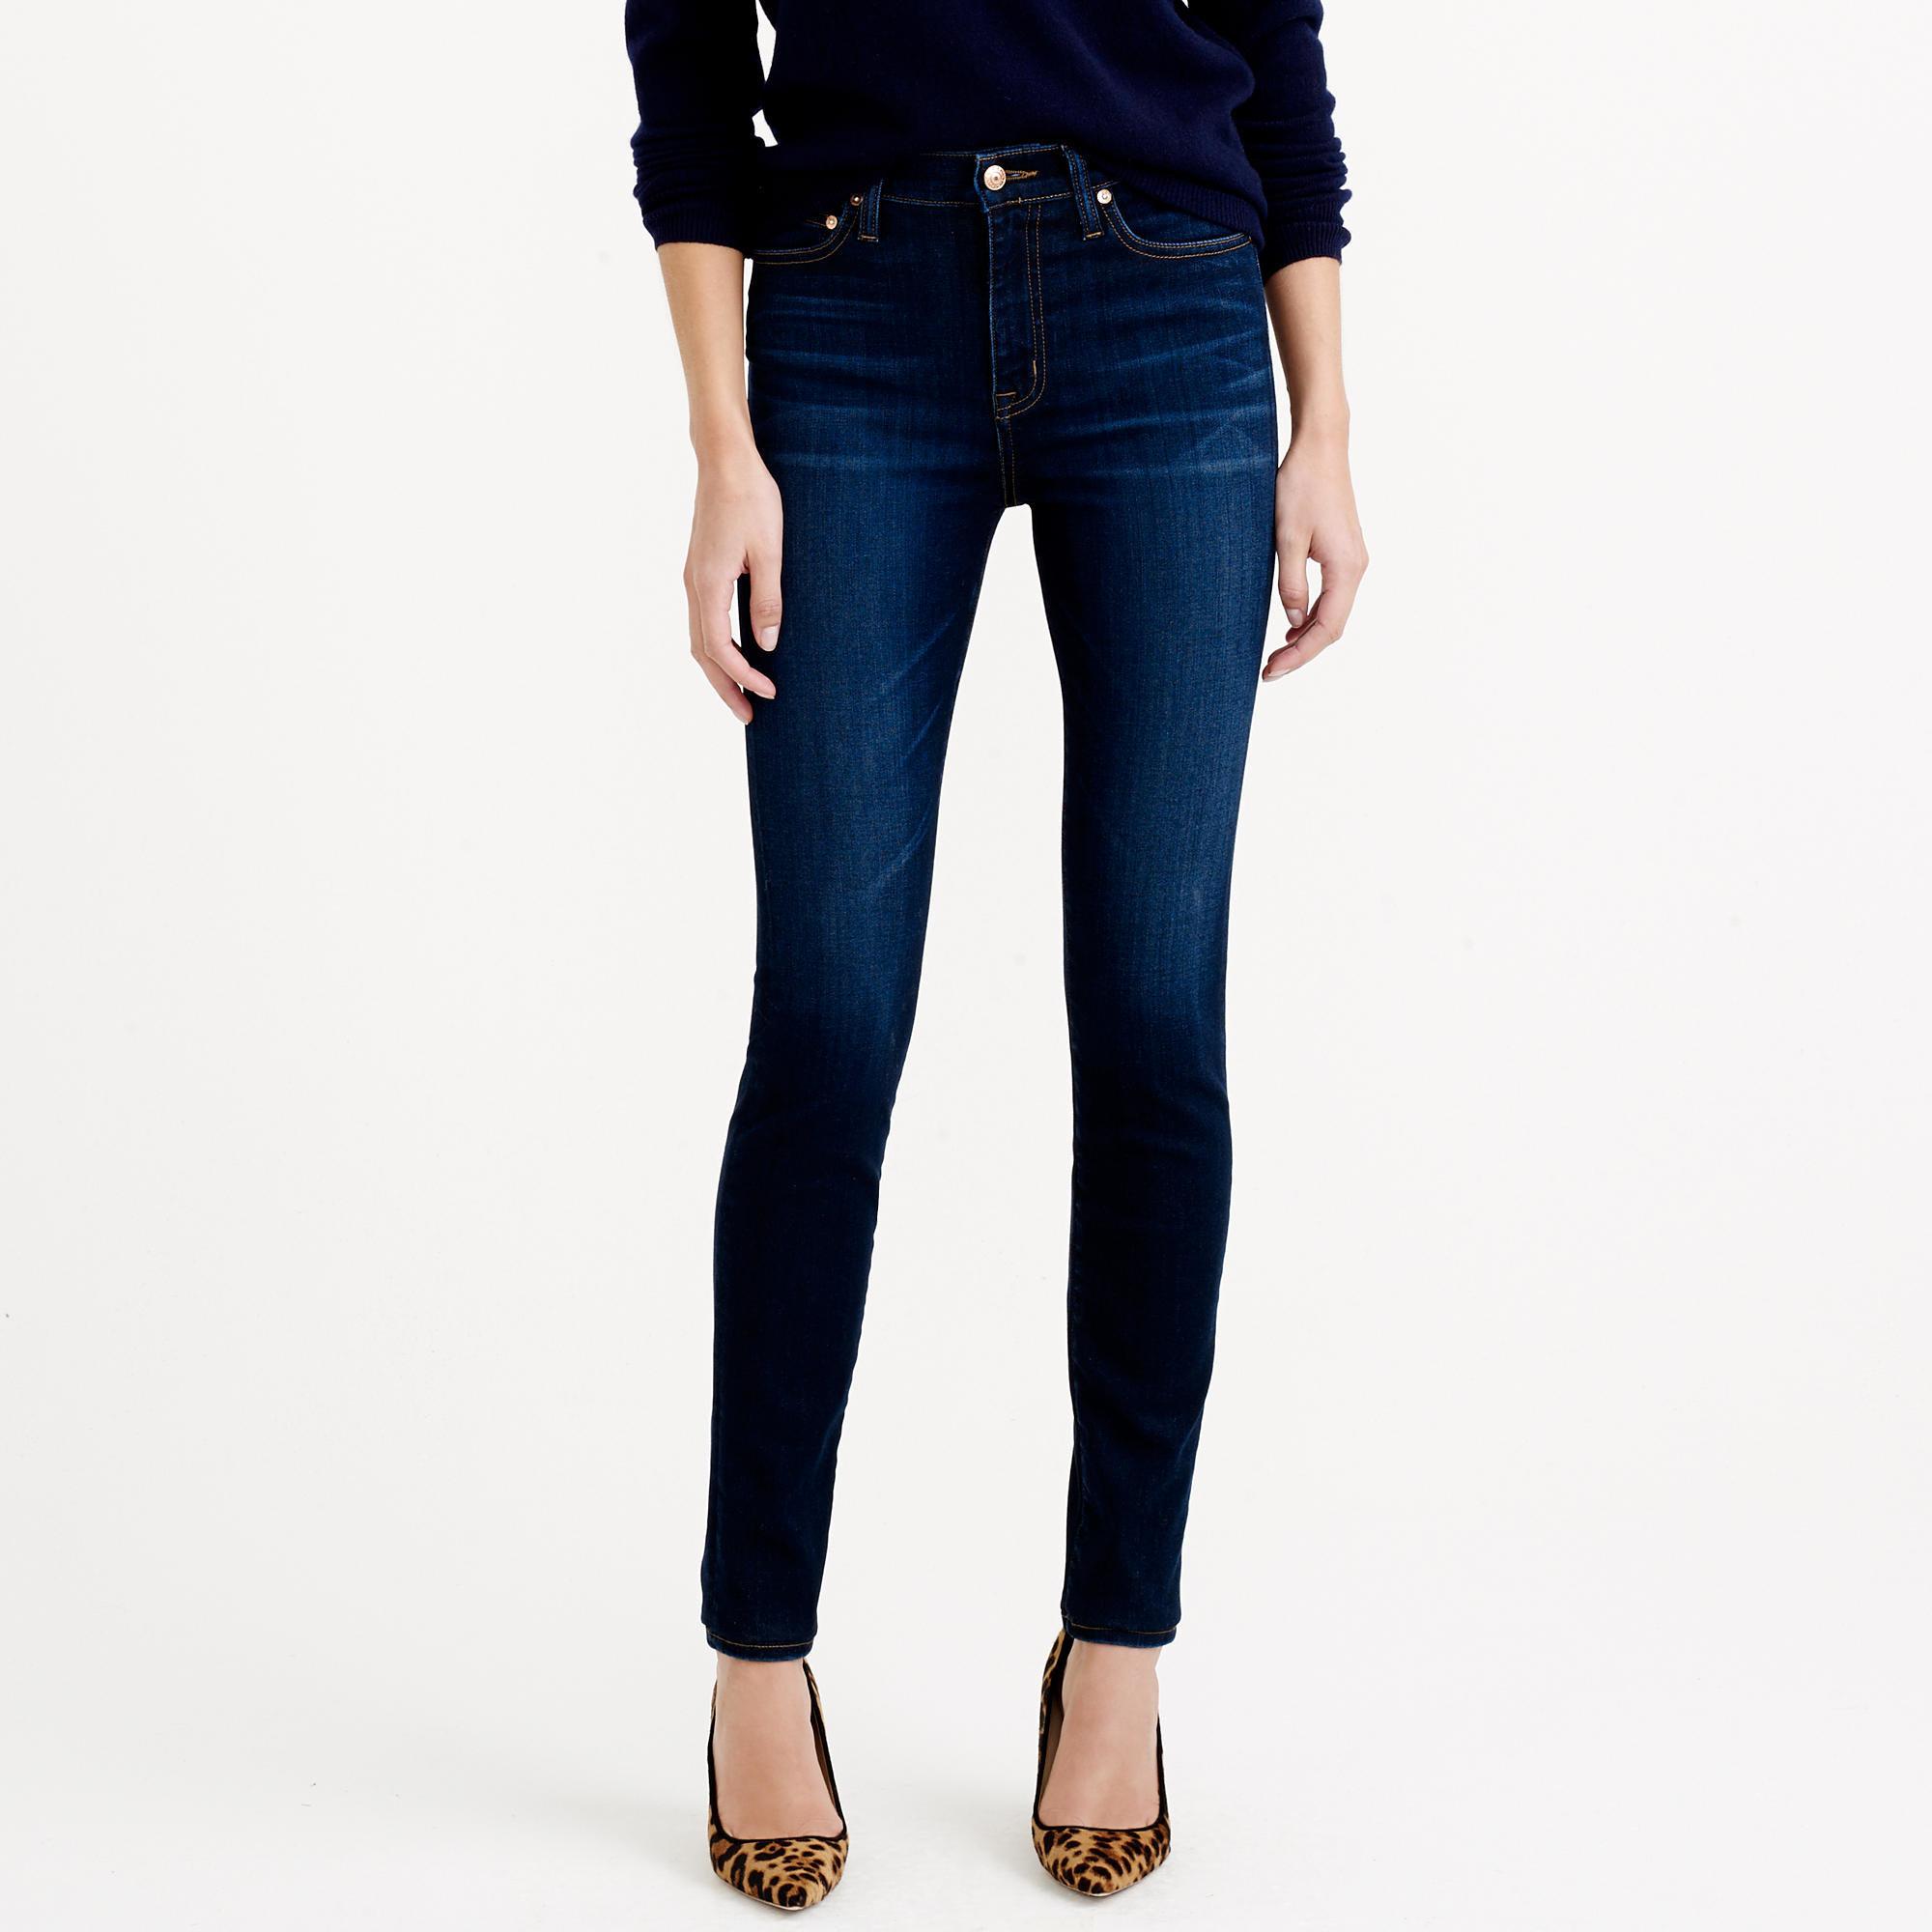 Gap curvy skinny jeans review